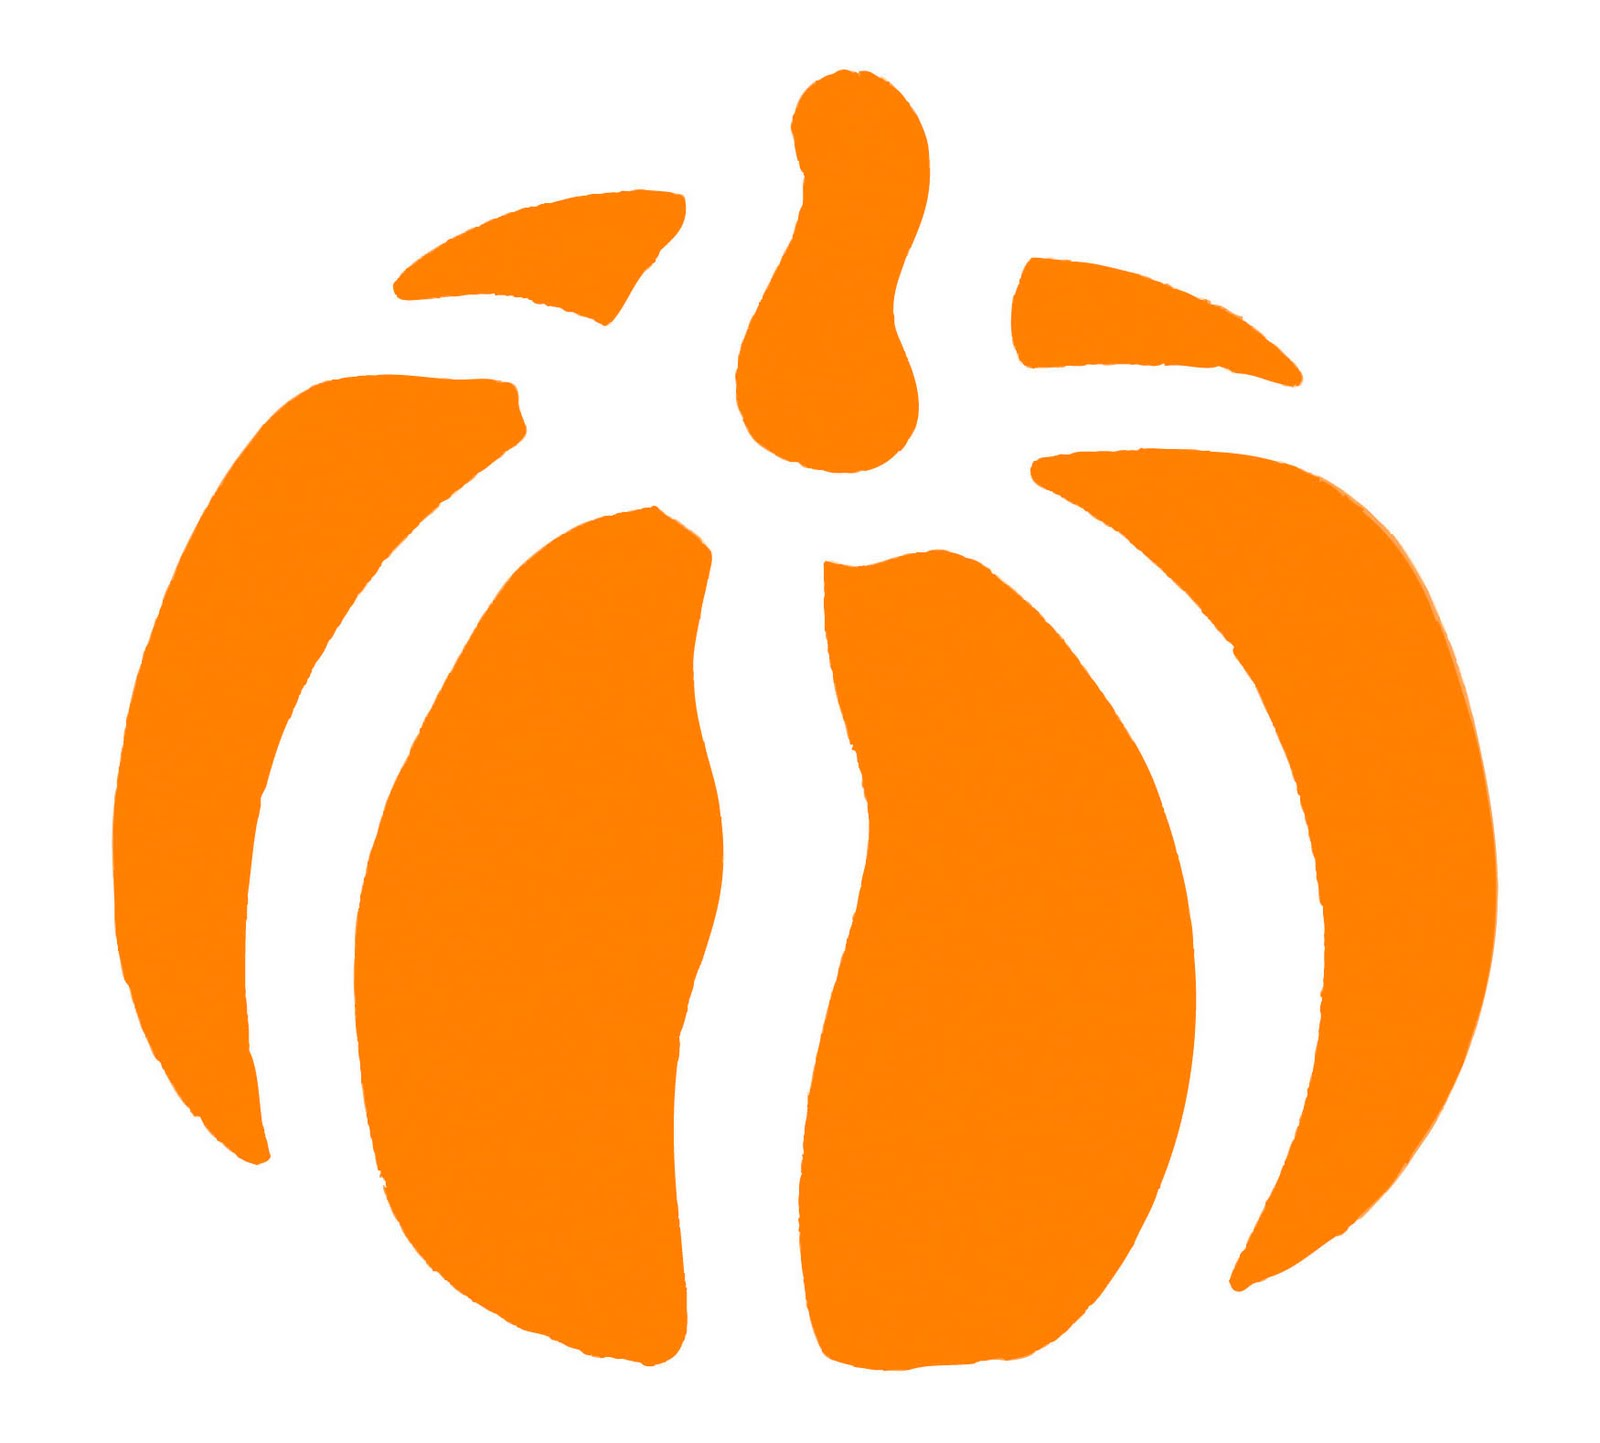 6 best images of fall pumpkin stencils free printable for Fall pumpkin stencils